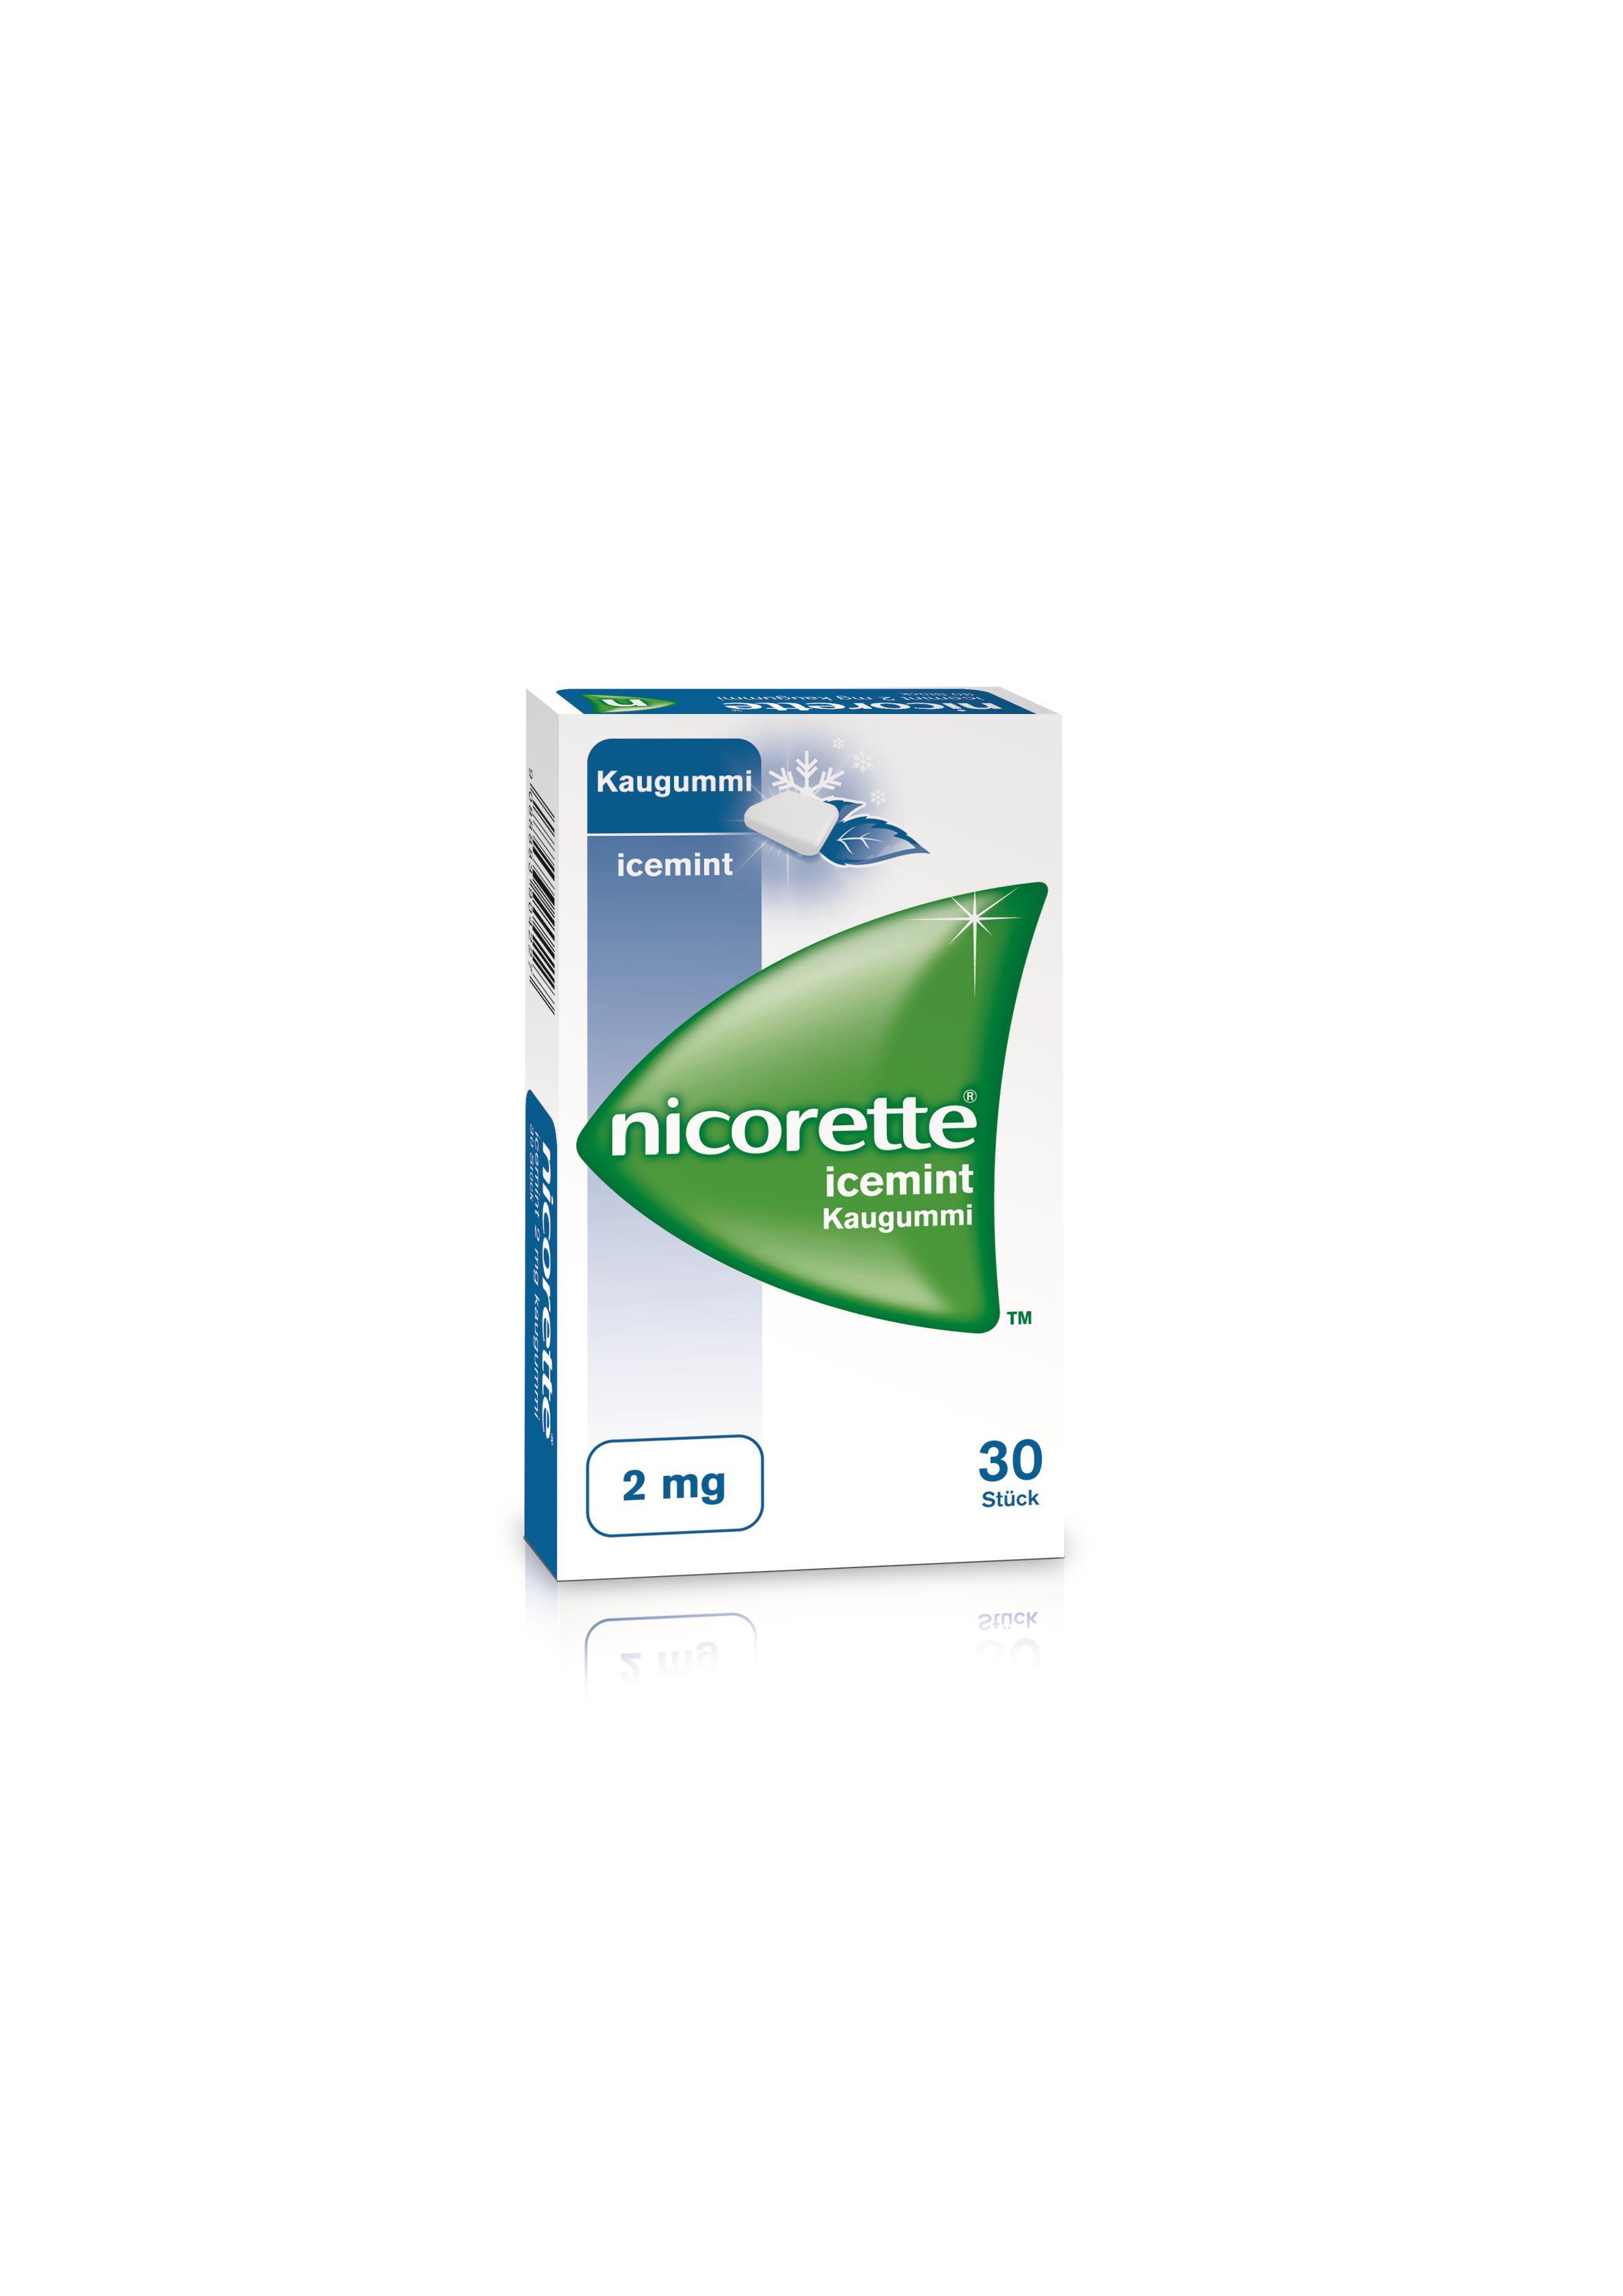 Nicorette Icemint 2 mg - Kaugummi zur Raucherentwöhnung